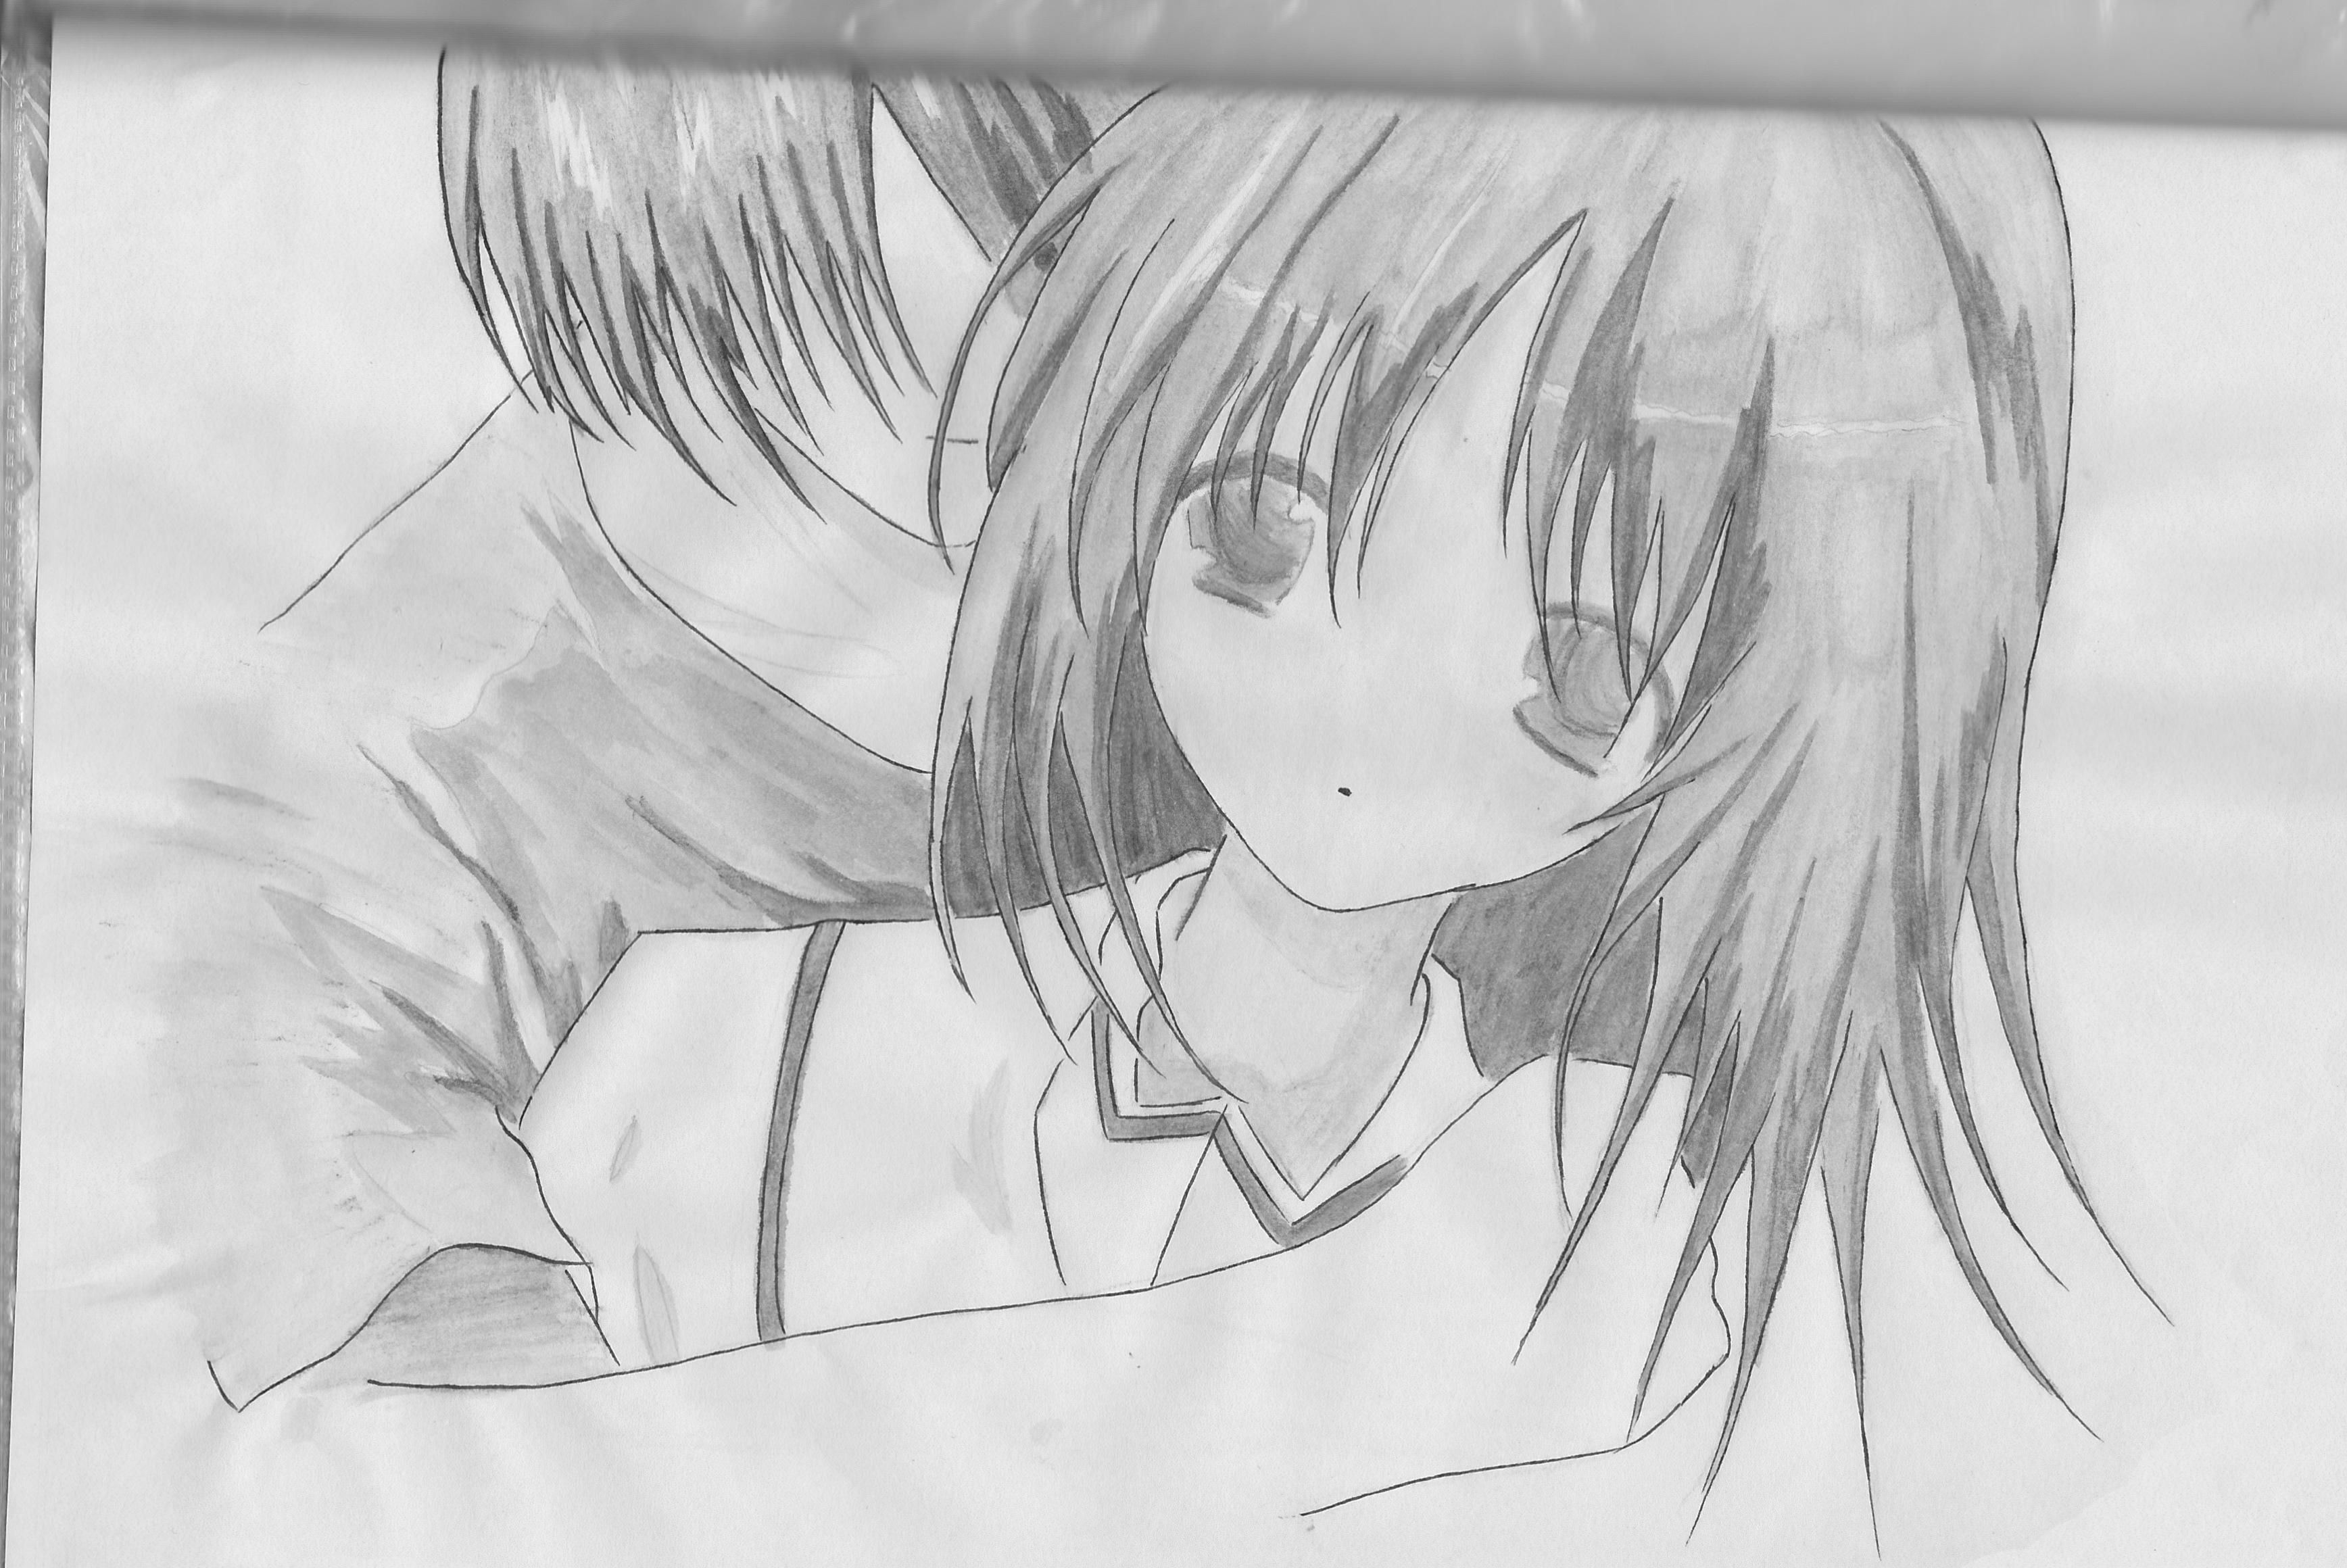 Anime Sketch 8 U0026#39;boy And Girlu0026#39;3 By Red-fish-blue-fish On DeviantArt